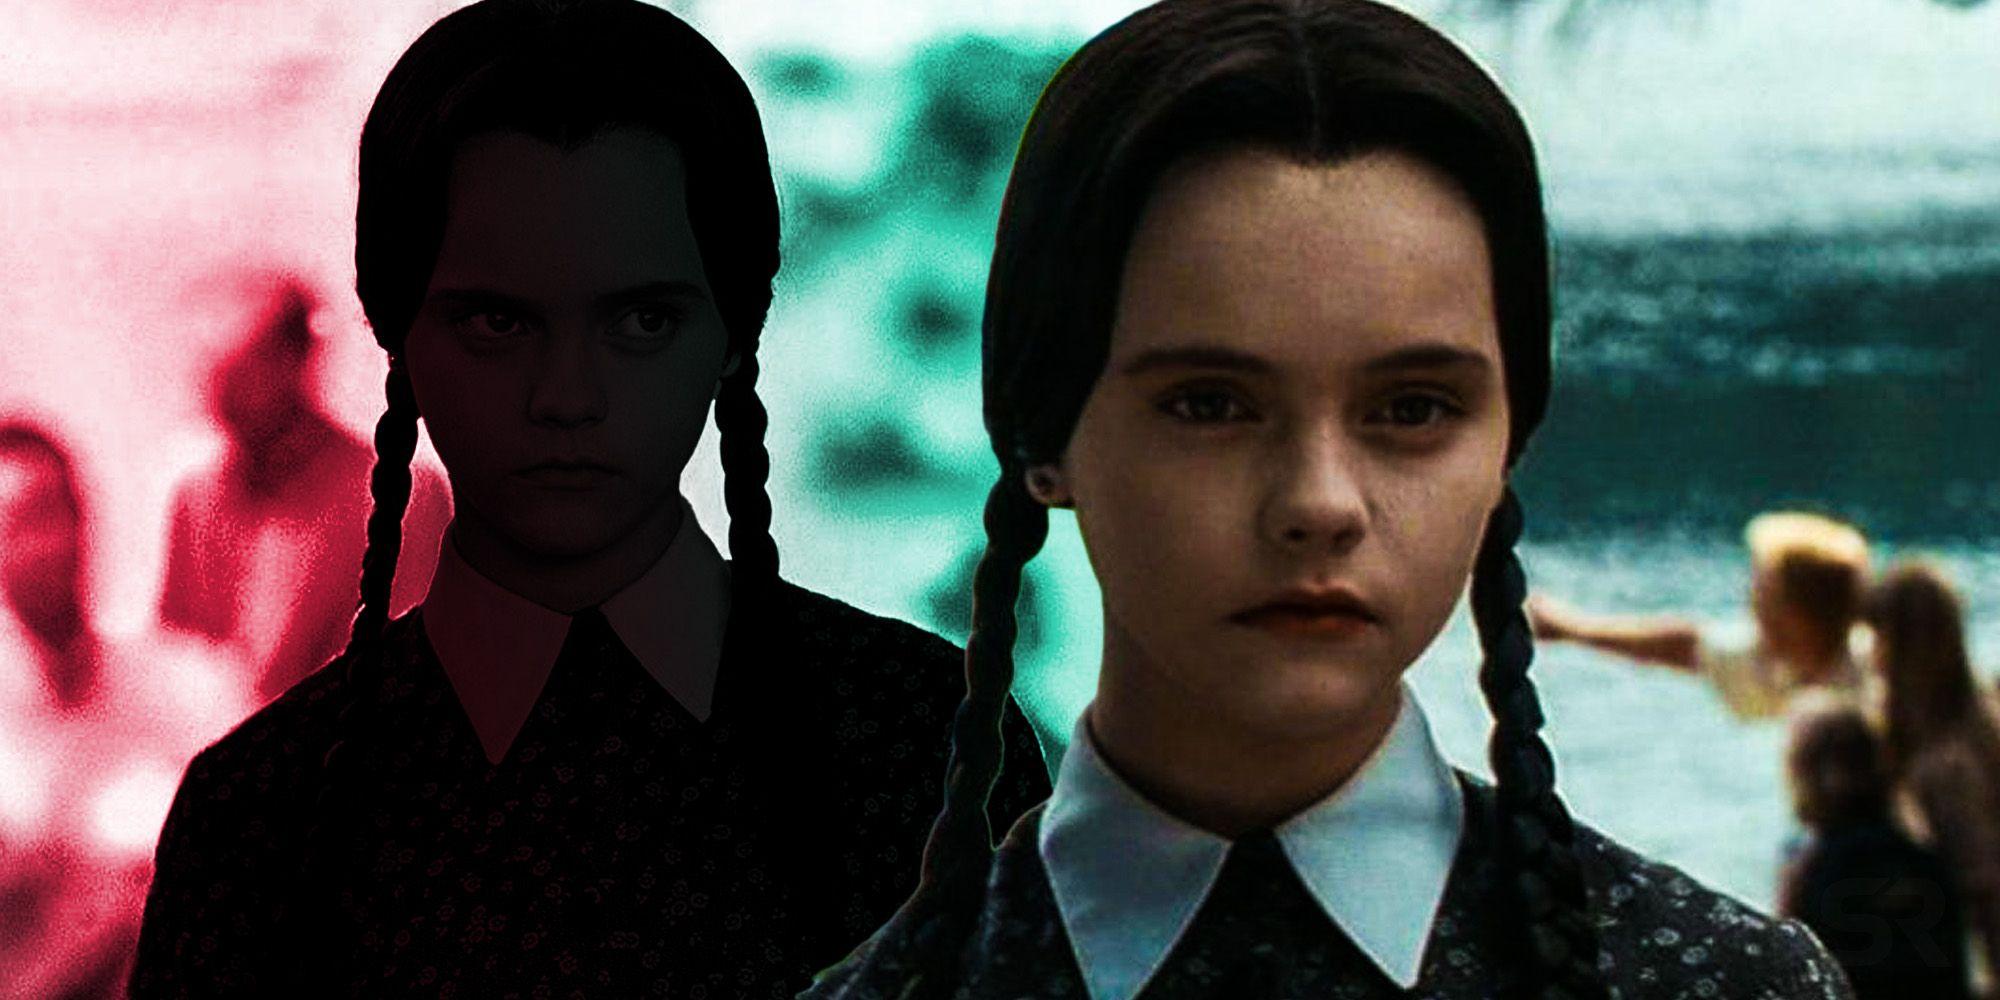 Casting Wednesday Addams For Tim Burton's Netflix Show